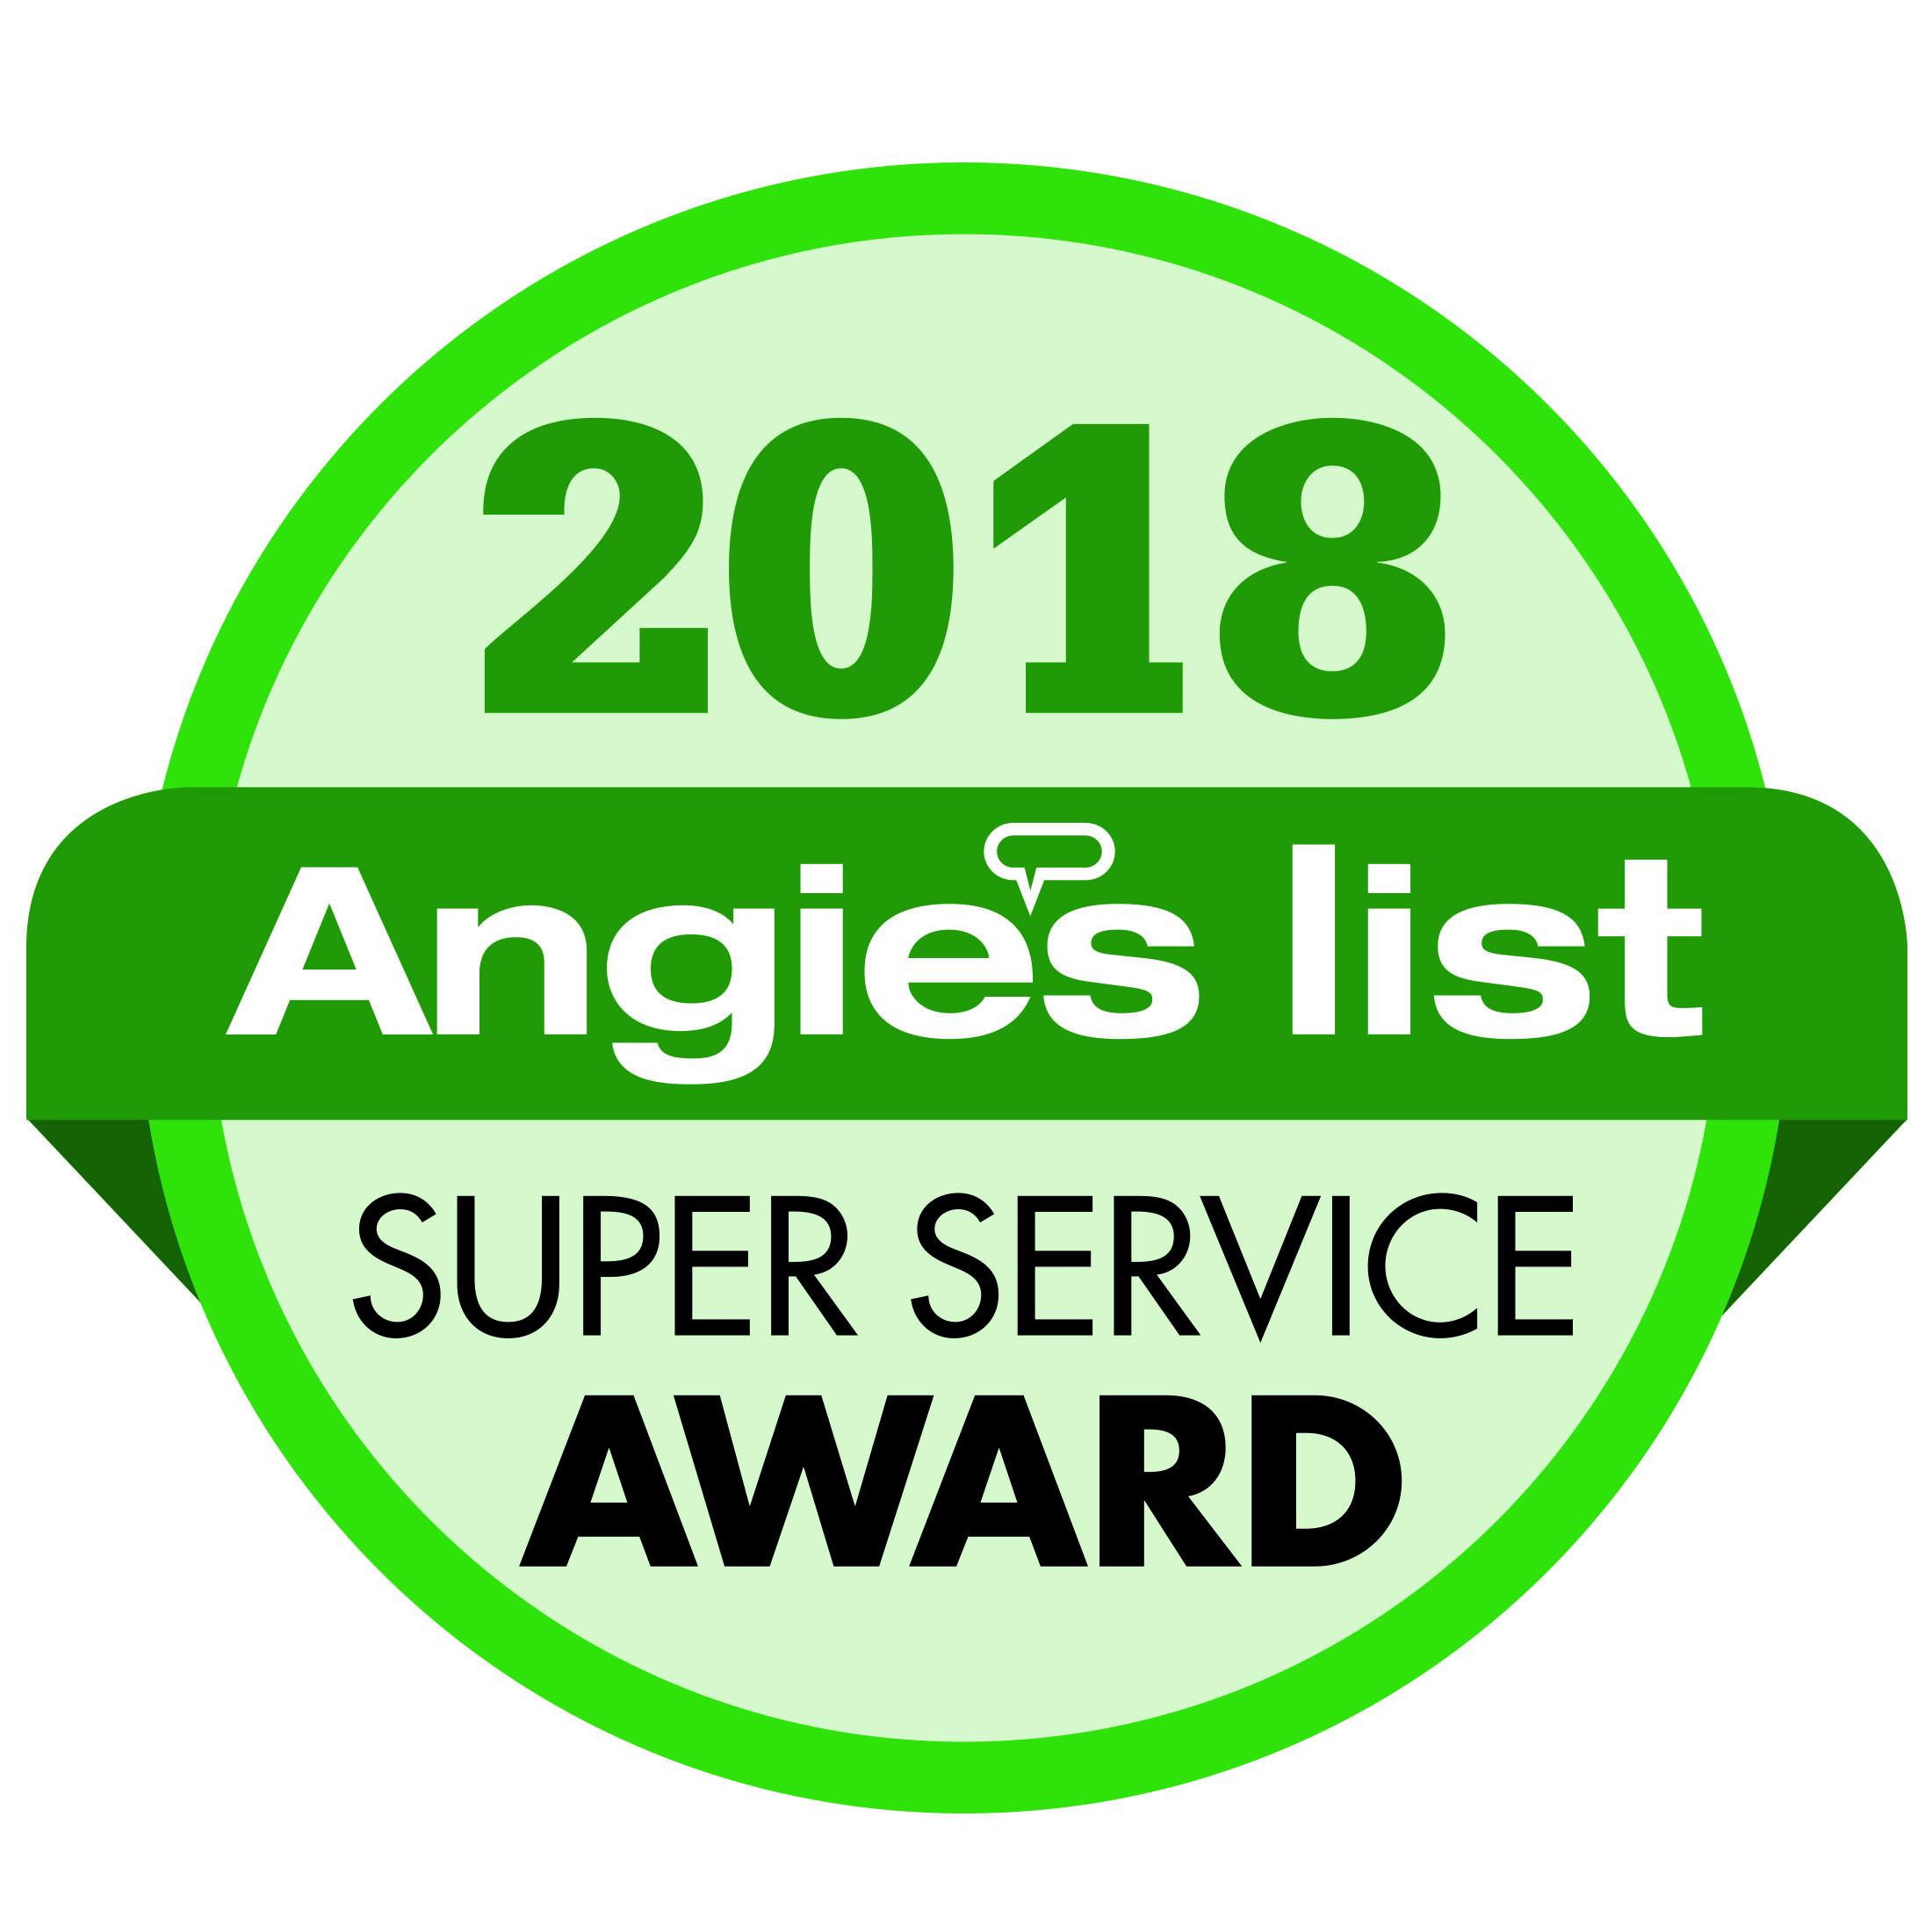 Angies List Super Service Seal 2018